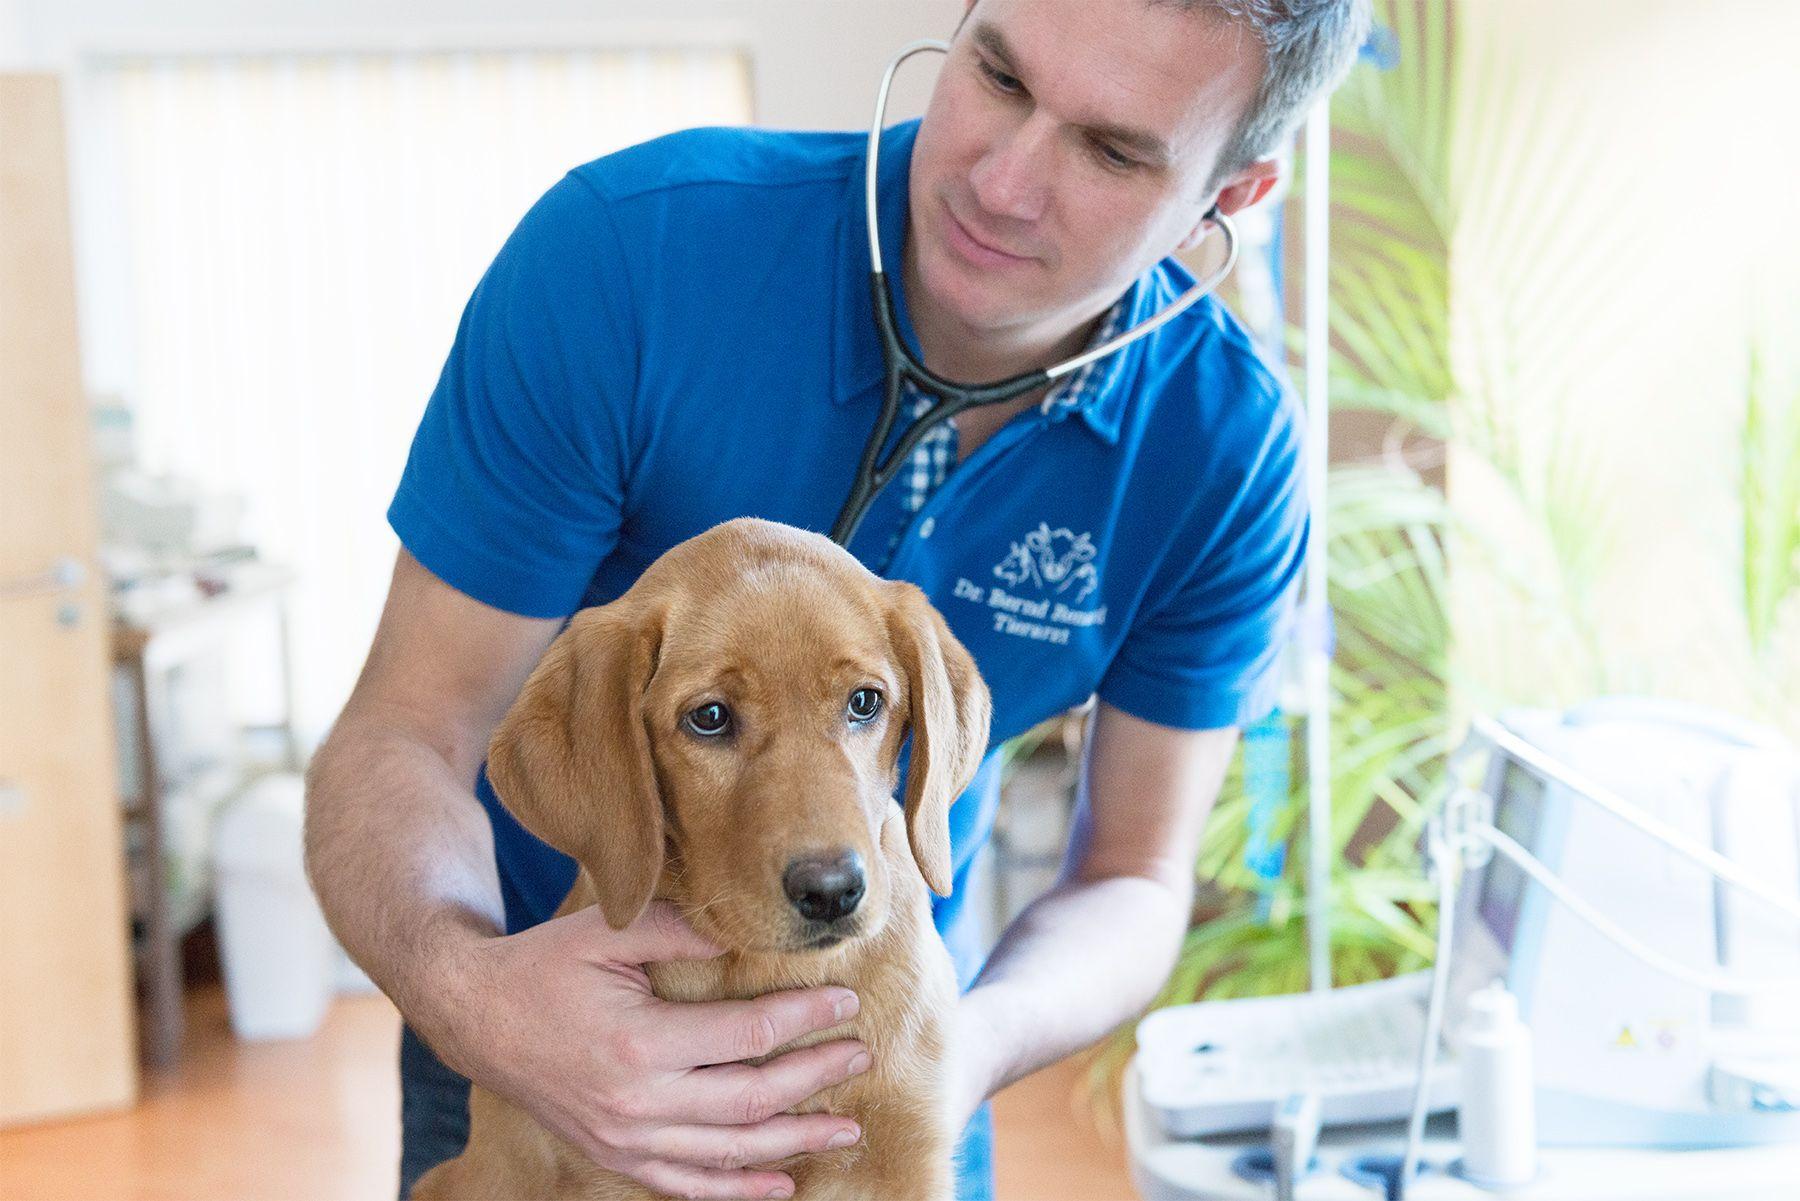 Tierarzt Notdienst Regensburg